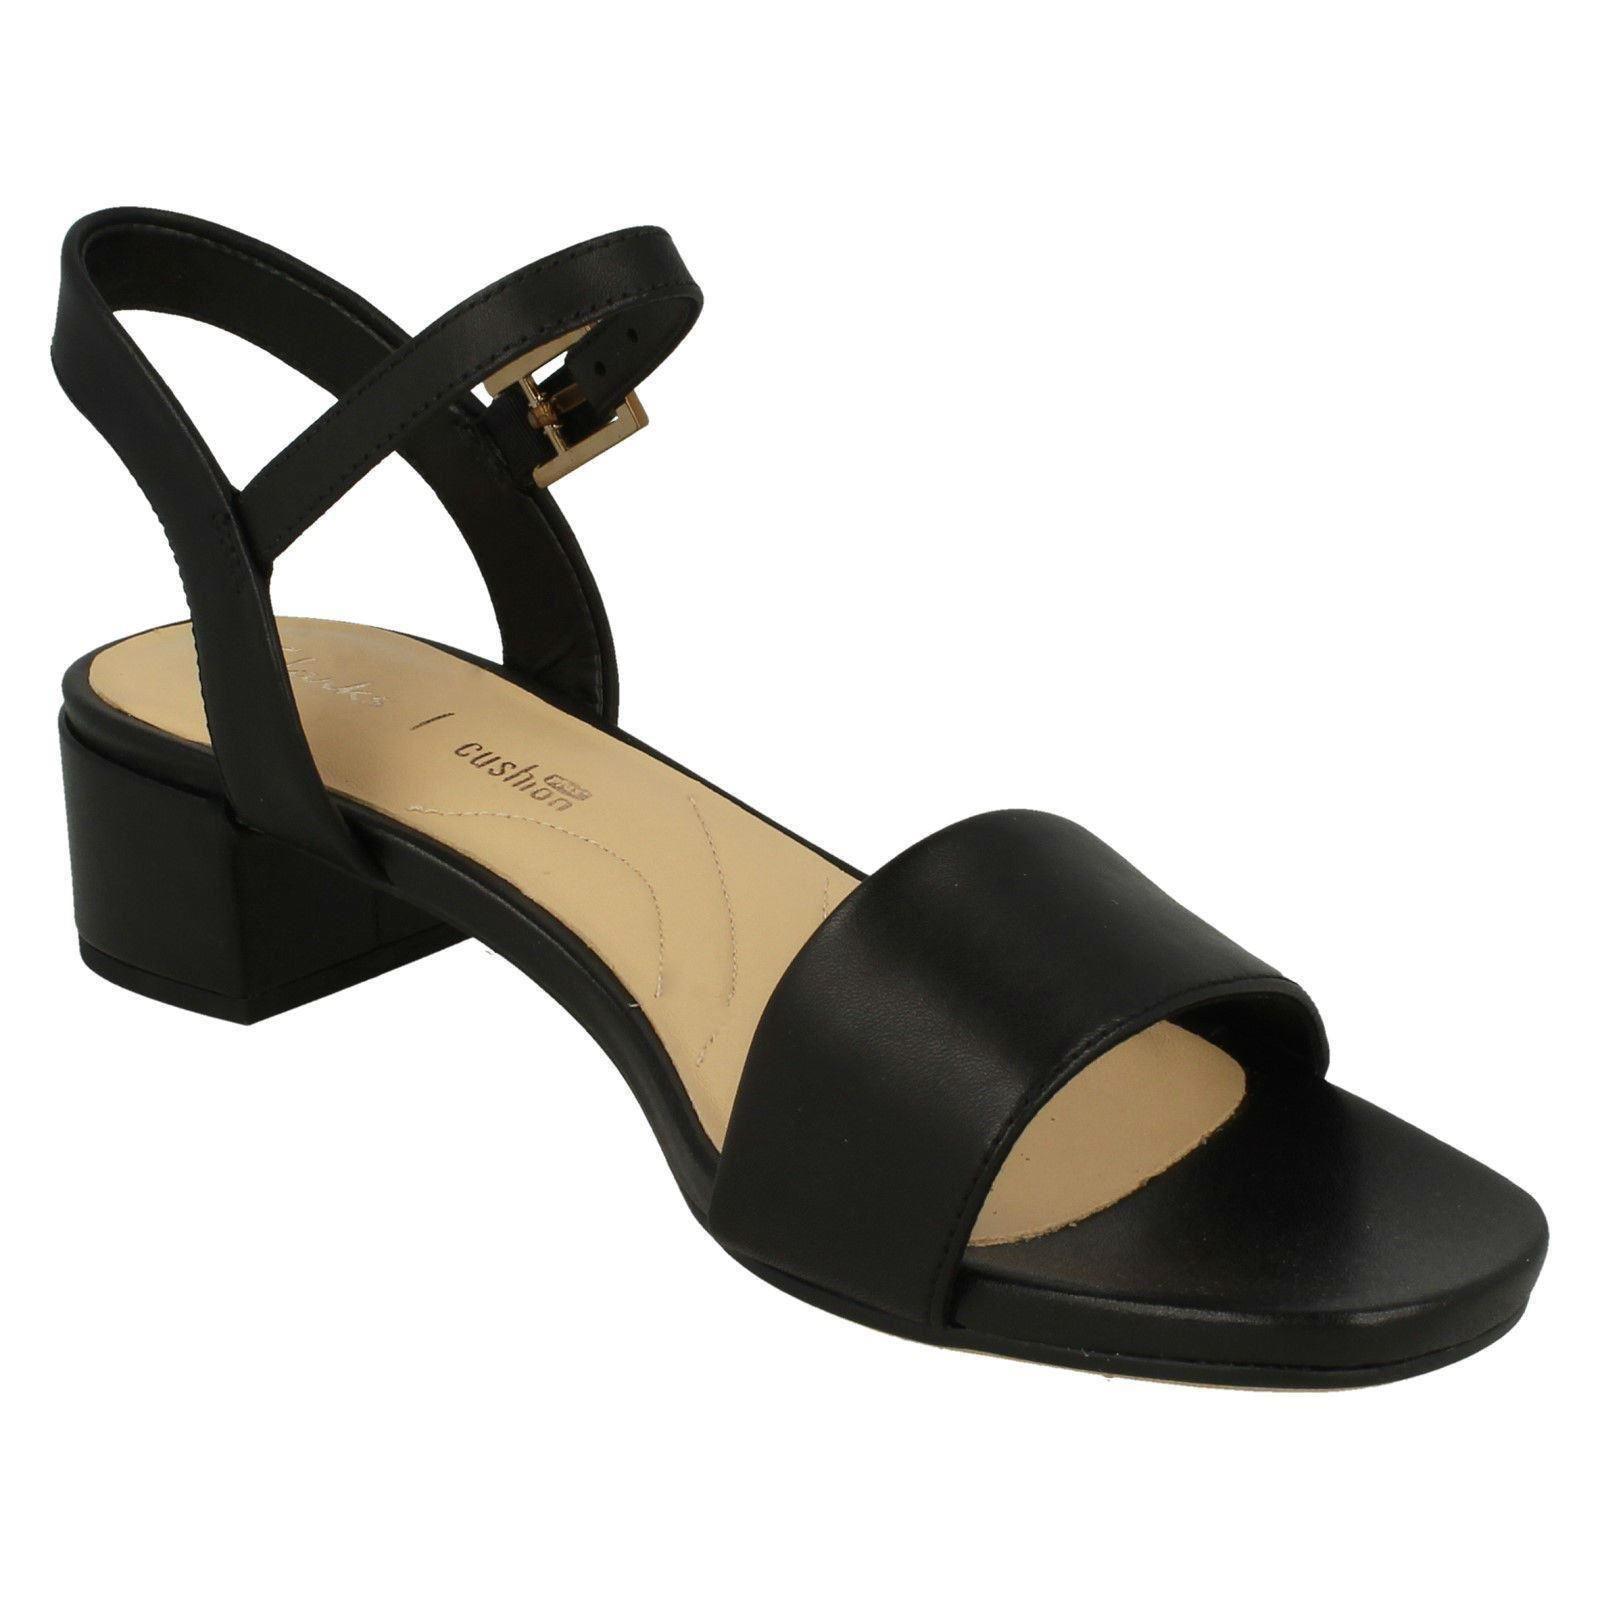 Toe sandali Iris Orabella tacco Peep Clarks Elegante nero con Ladies wAx8qpYnq